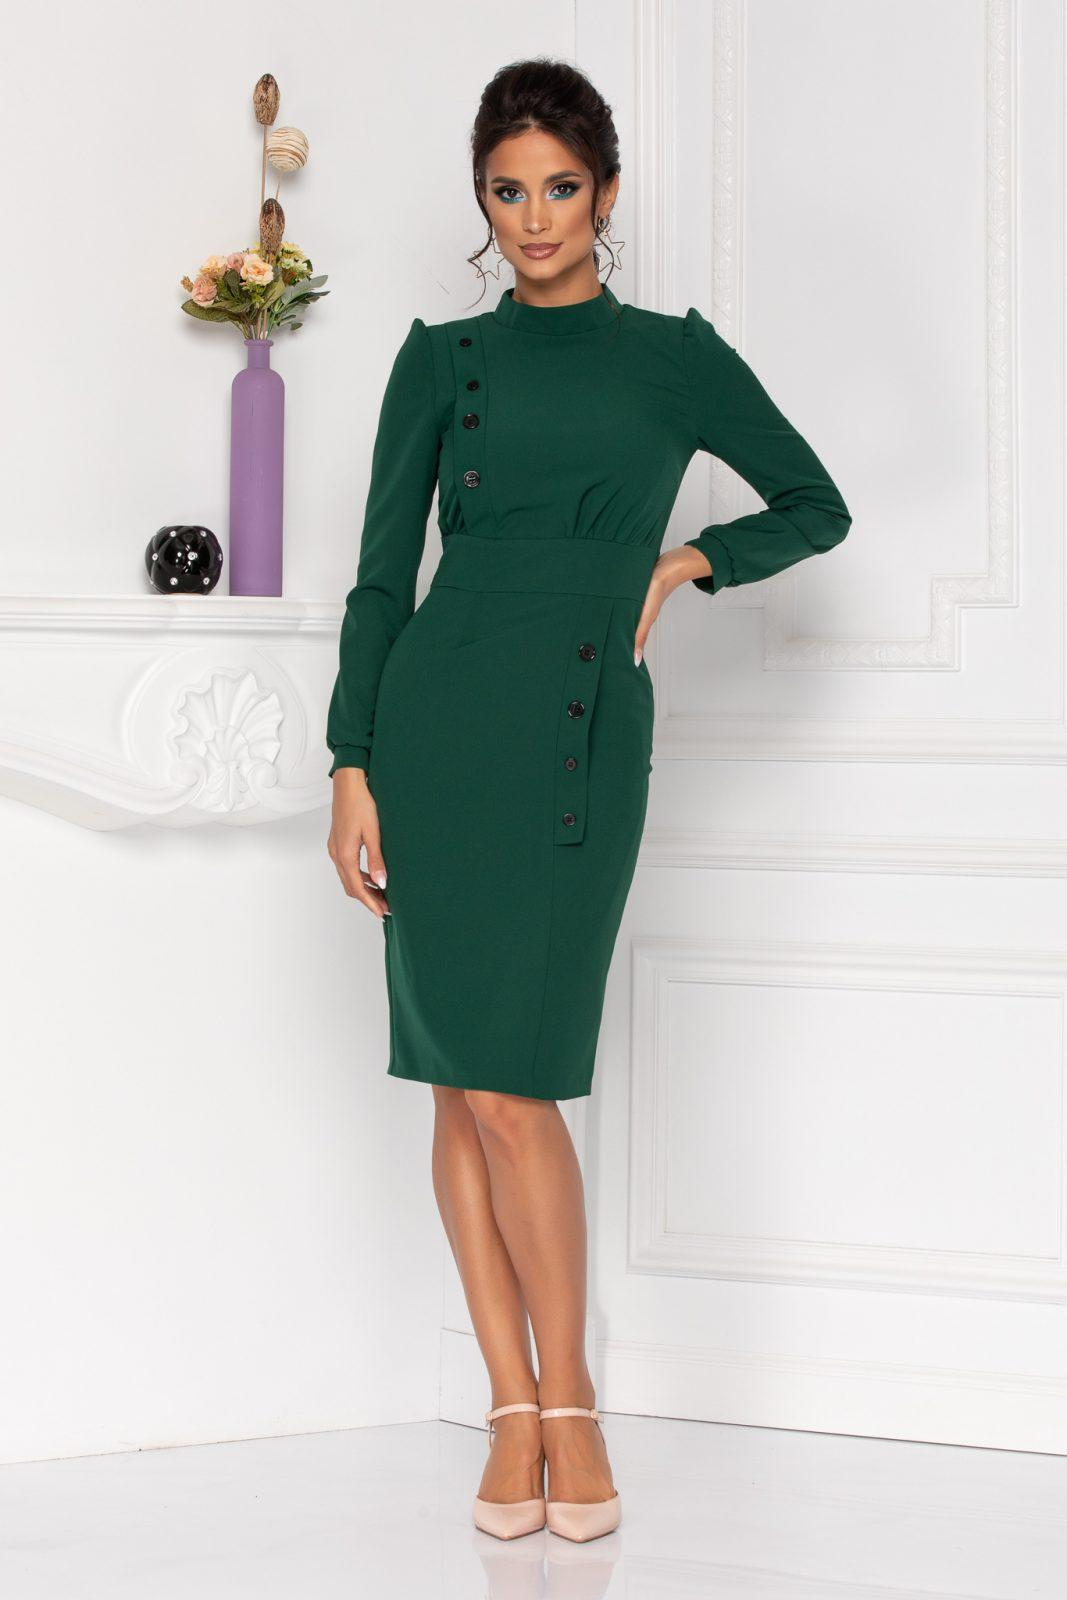 Moze Geneve Green Dress